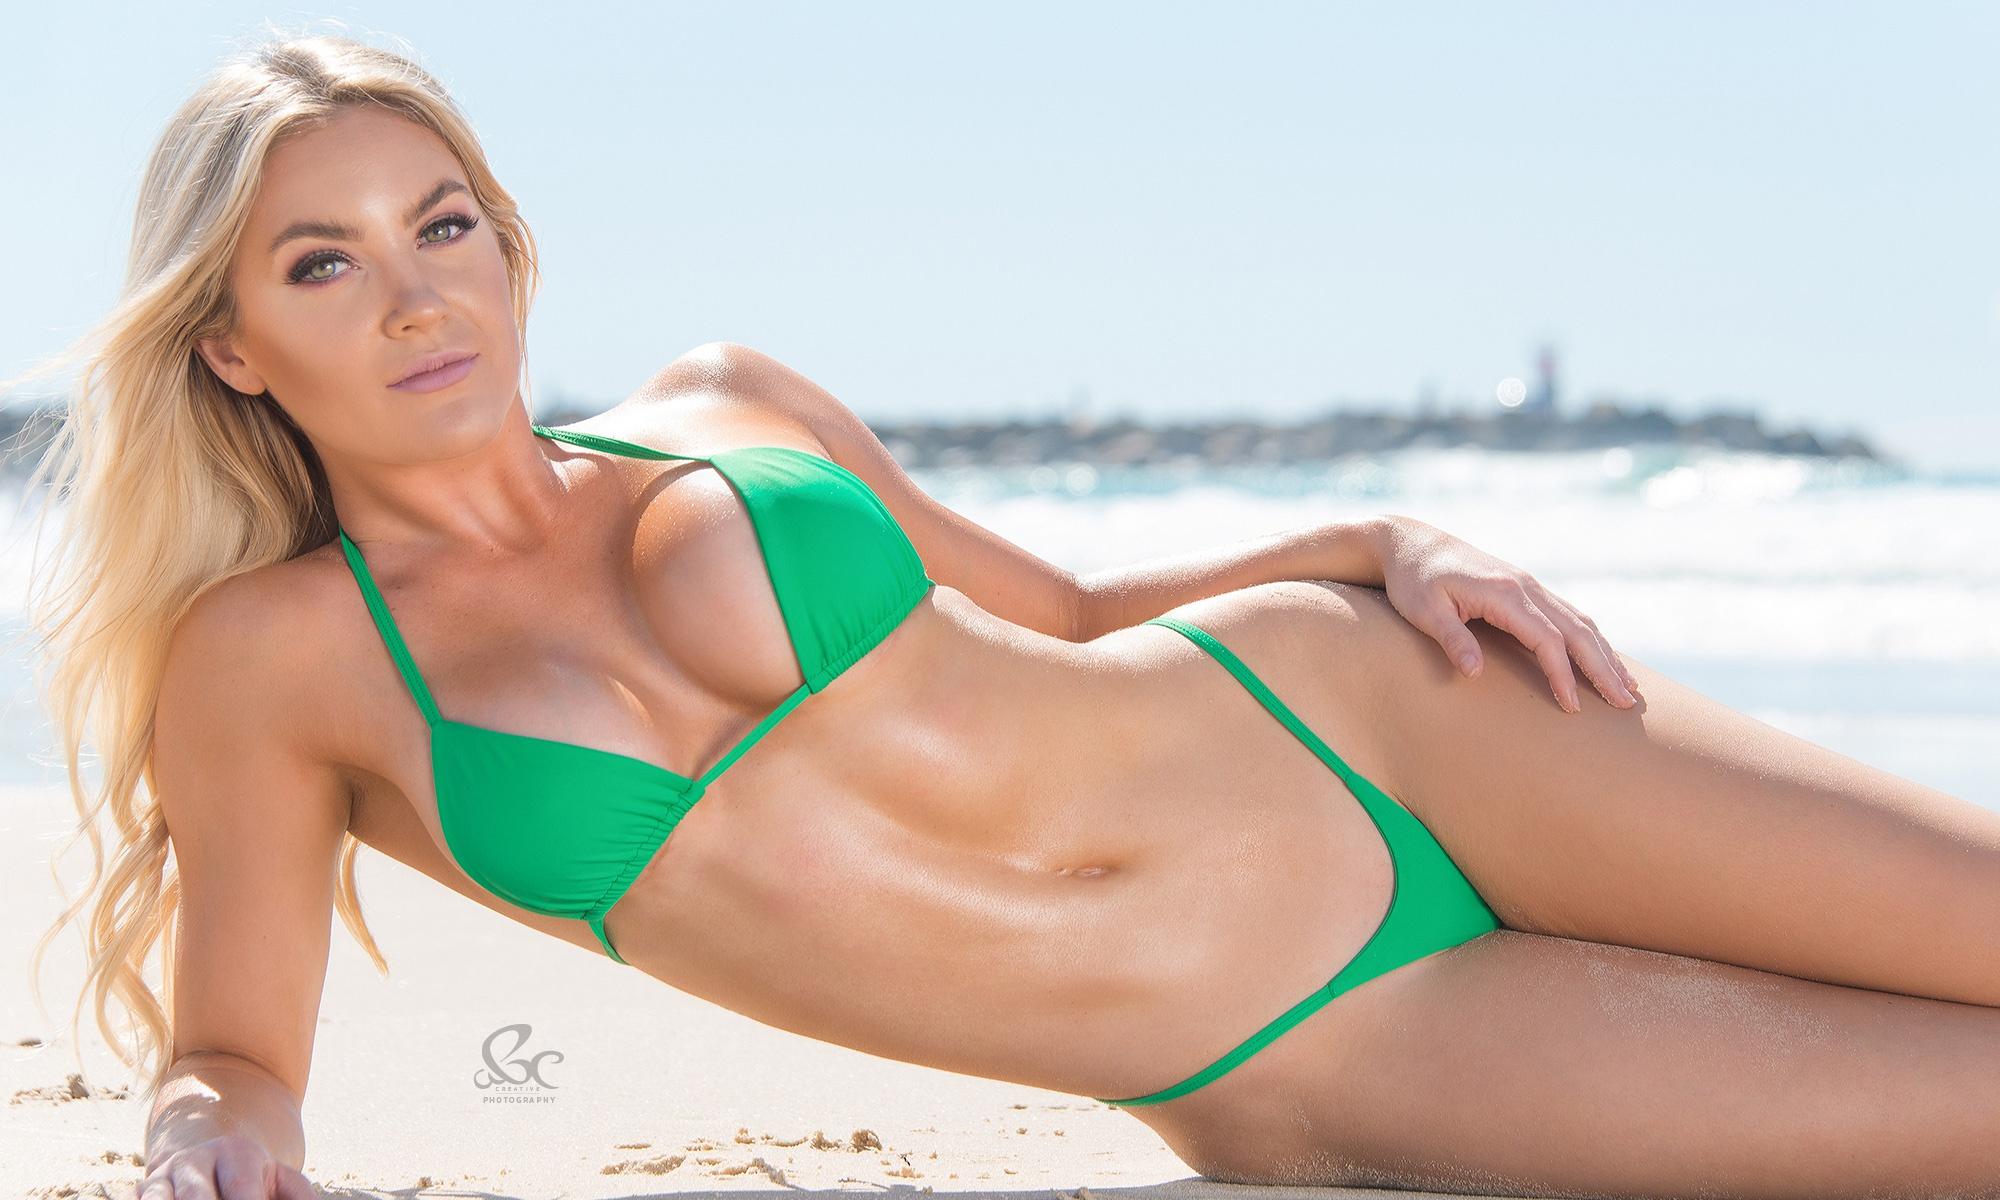 Beautiful, Blonde Female Model In Bikini On Background Of Pool Stock Image